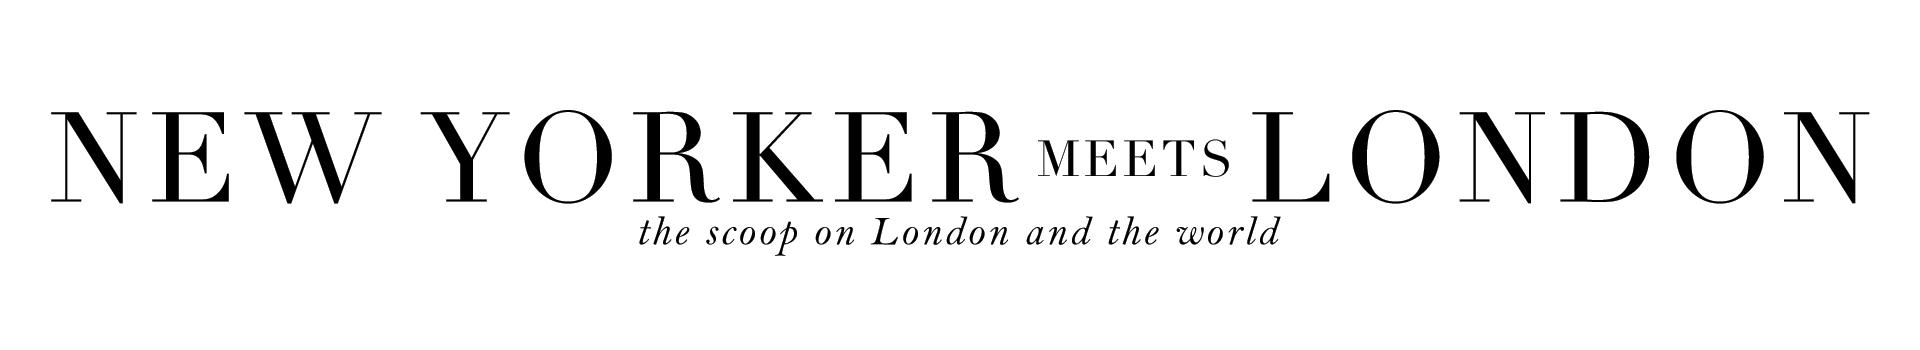 New Yorker Meets London - Food, Travel & Lifestyle Blog